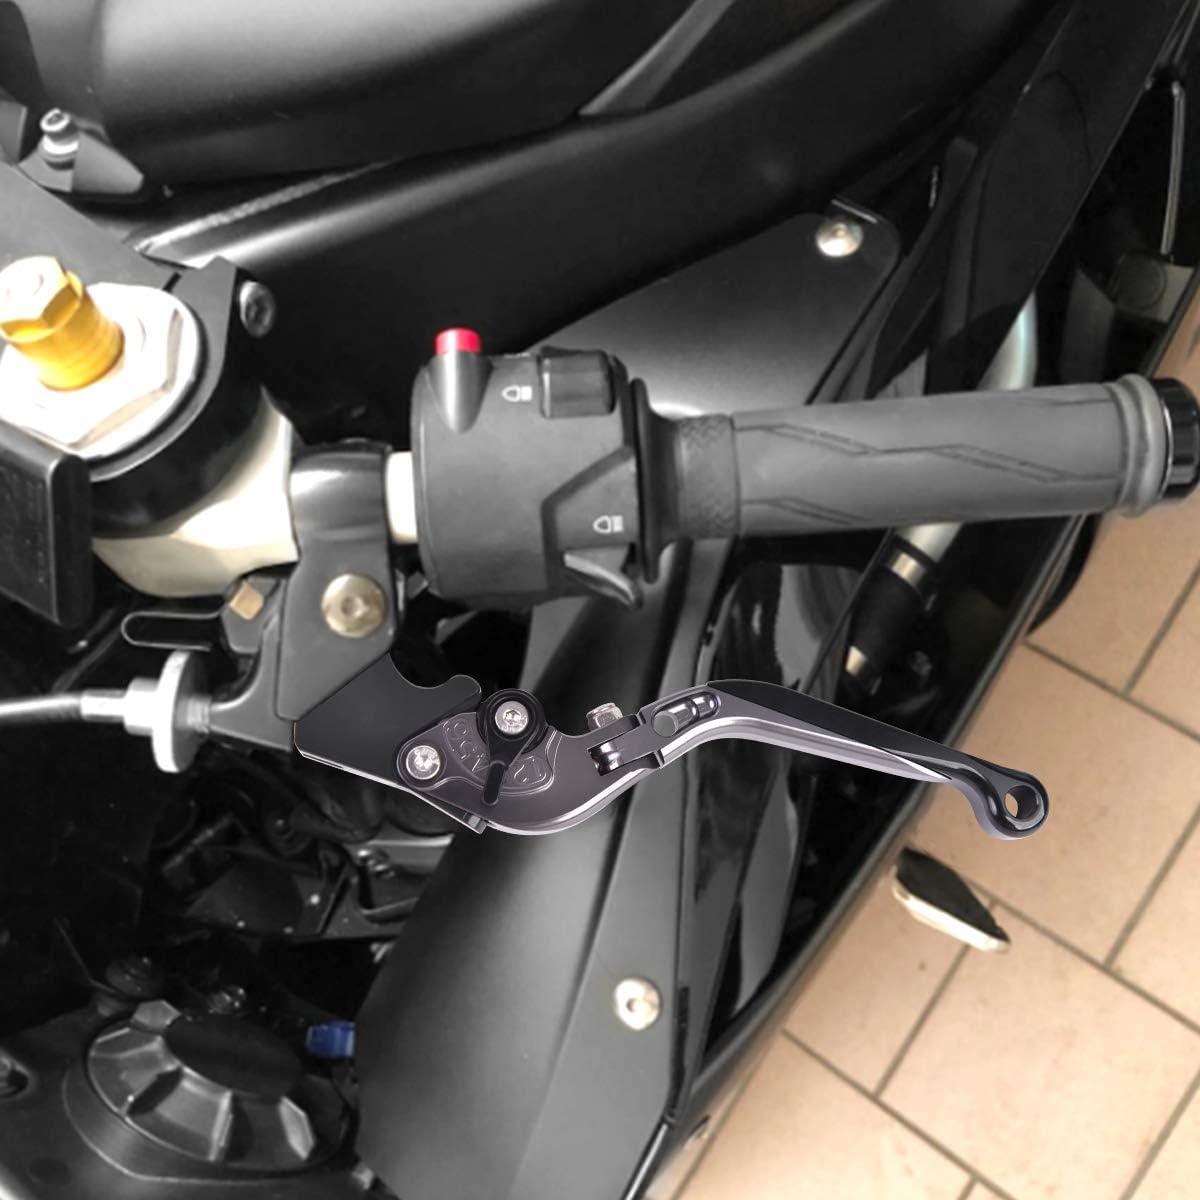 Kupplungshebel Skalierbar CNC Motorrad Hebel Blau Schwarz 2009-2016 Bremshebel Klappbar VERSYS 650 Kawasaki ninja 650R 2009-2014 ER-6N